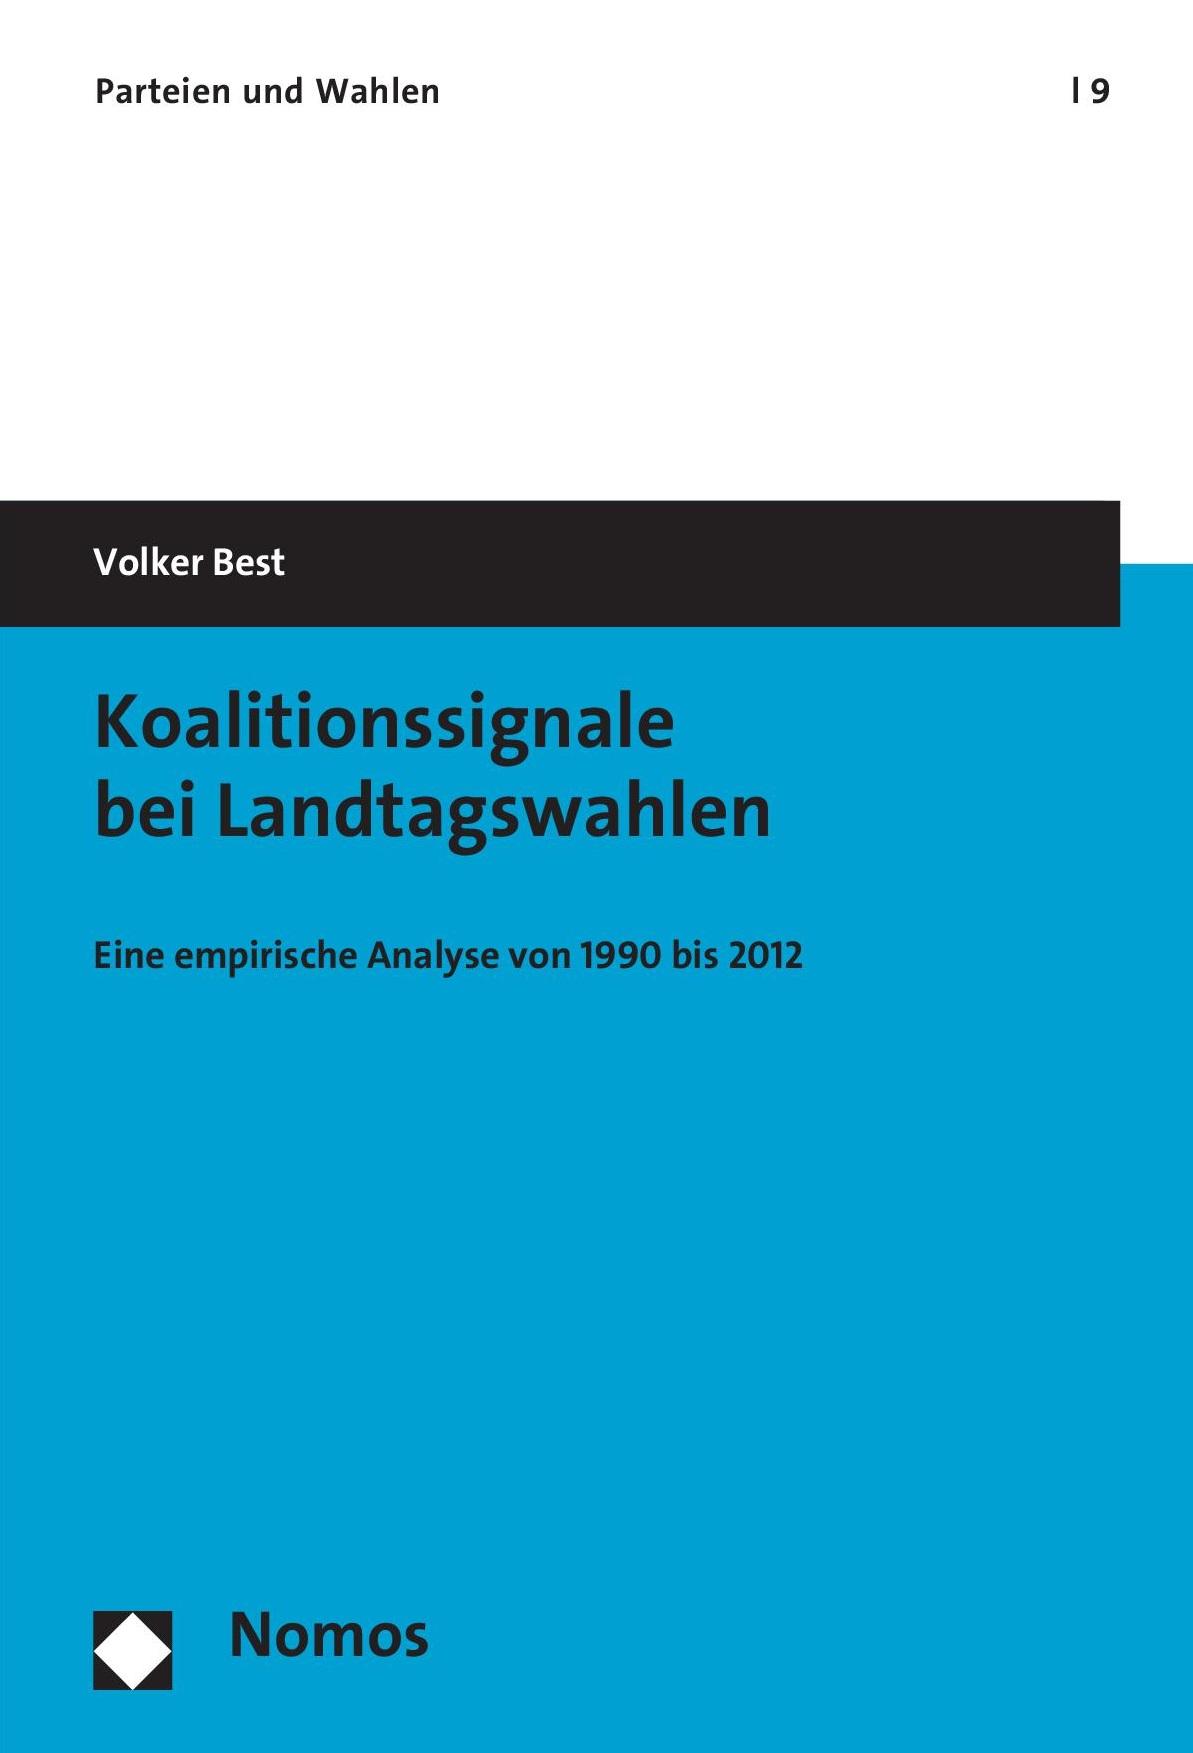 Volker Best: Koalitionssignale bei Landtagswahlen